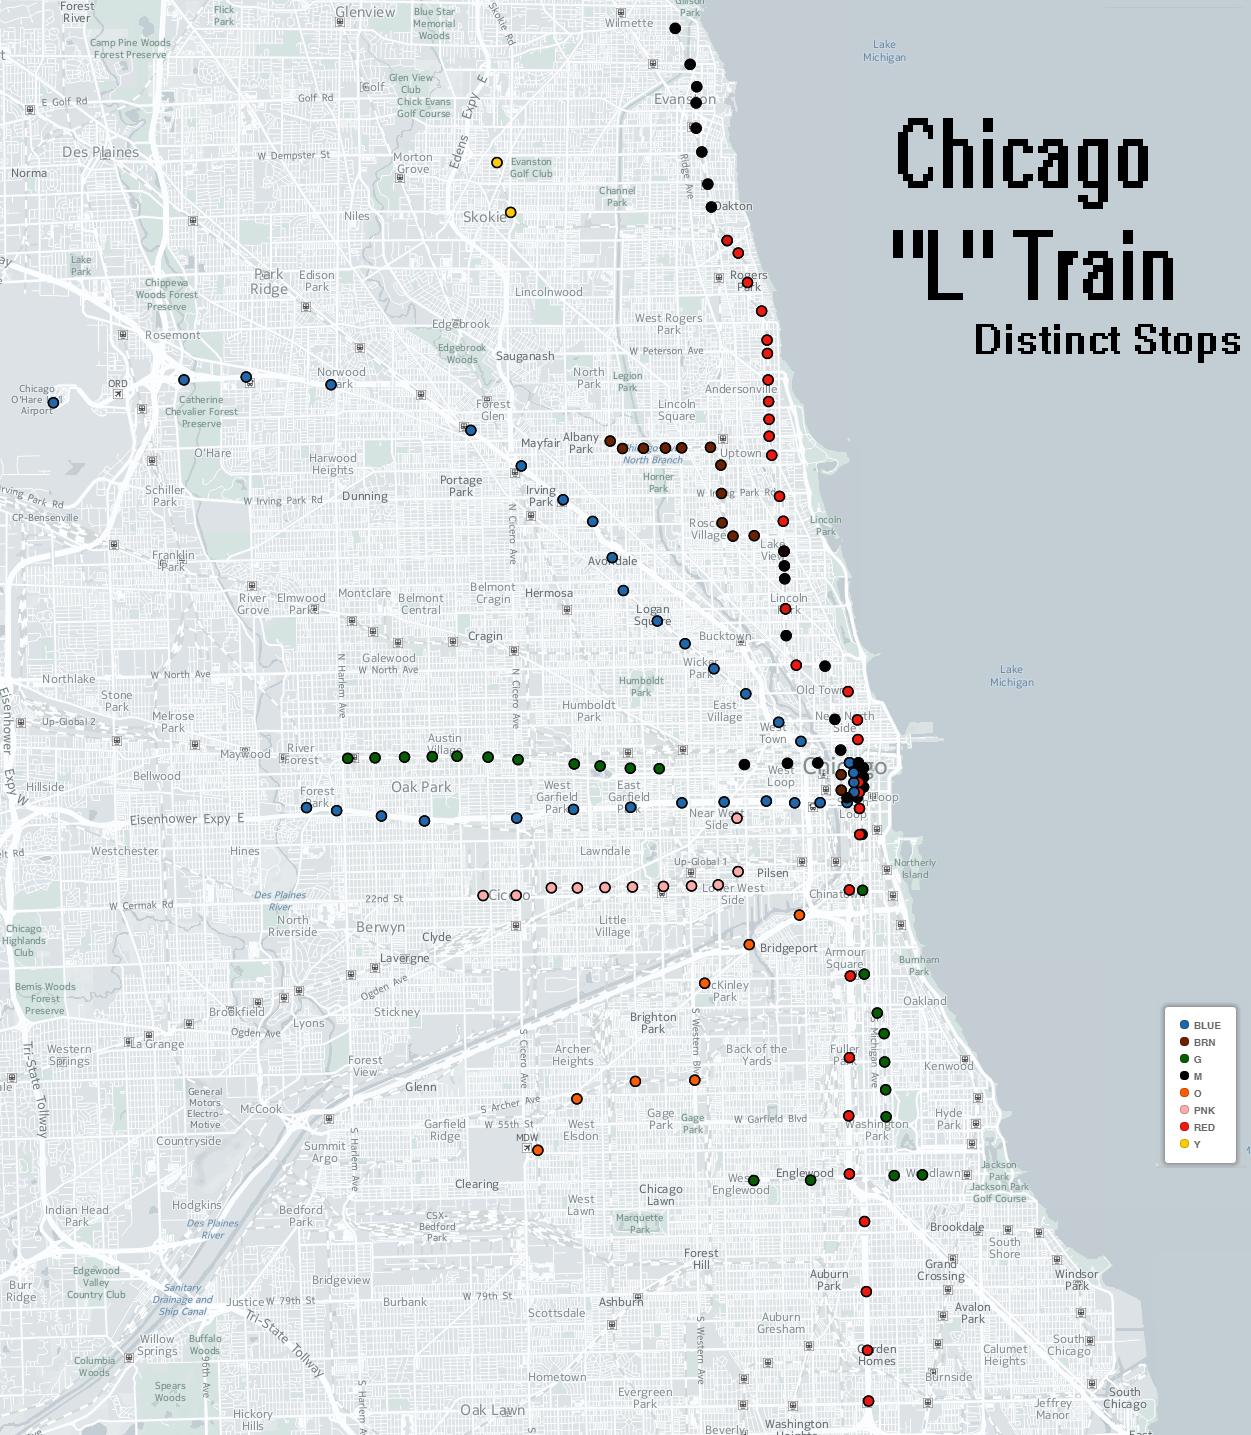 Chicago L Train Distinct Stops Map